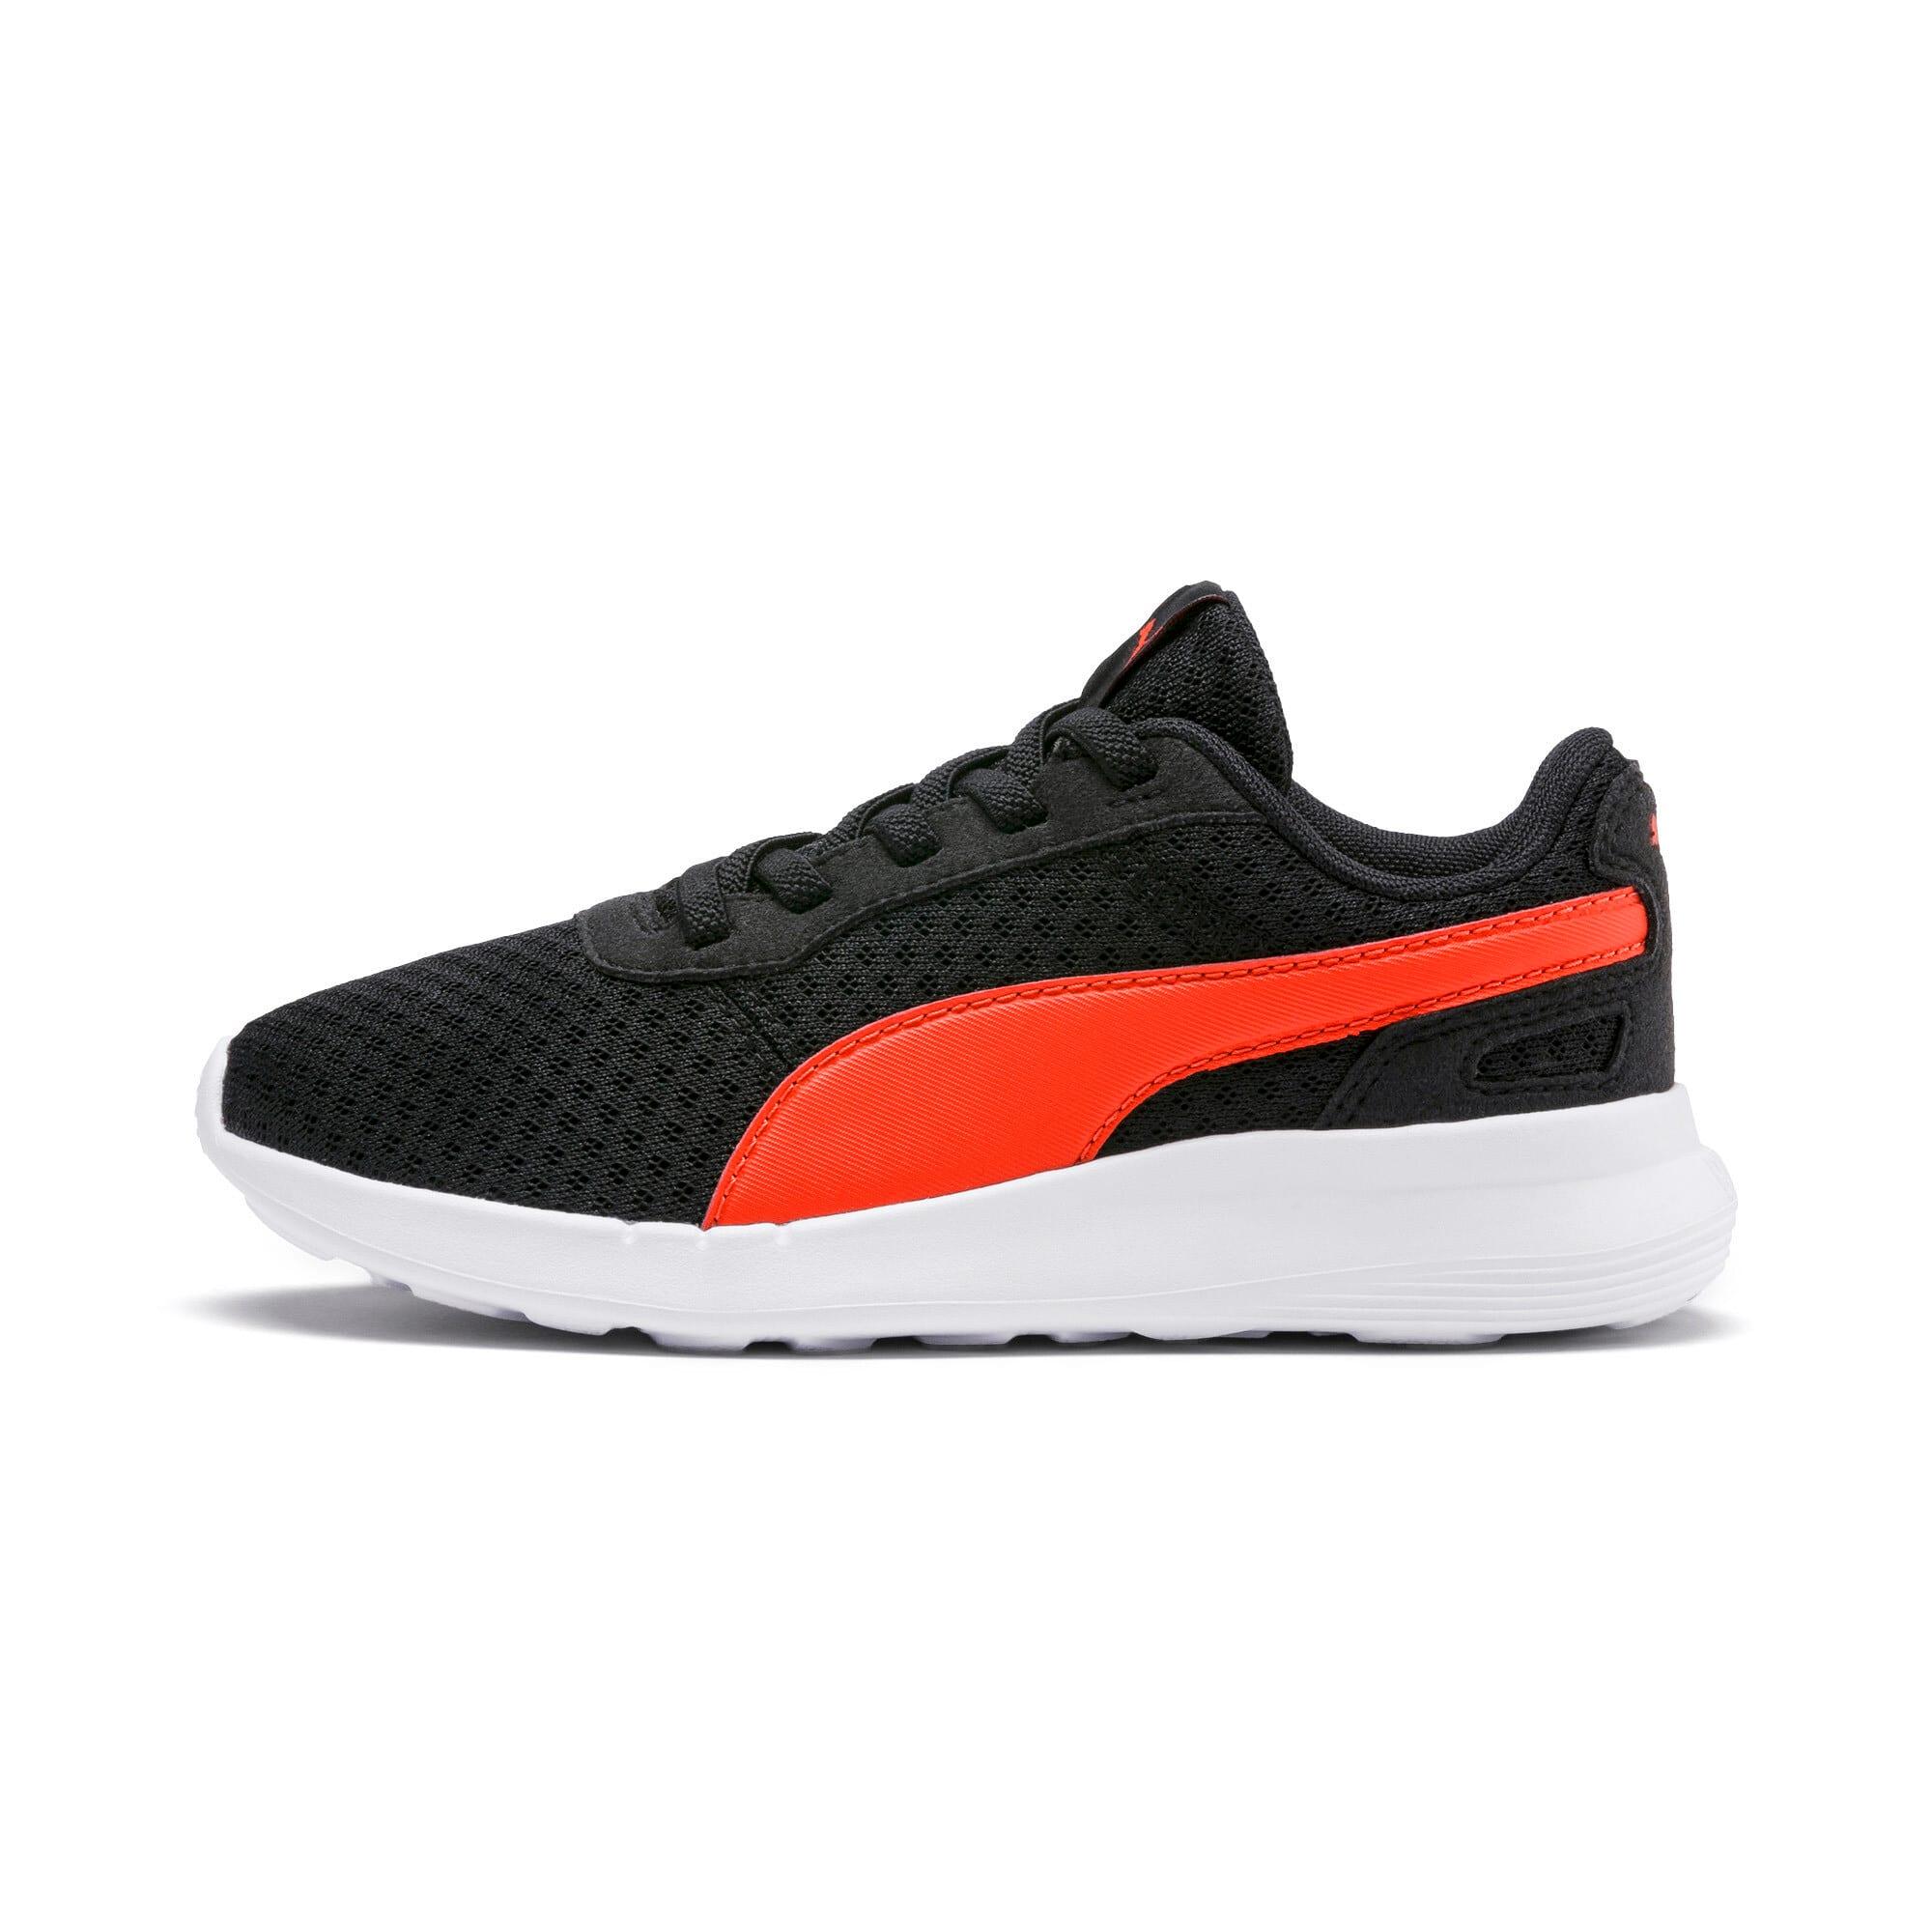 Thumbnail 1 of ST Activate Sneakers PS, Puma Black-Cherry Tomato, medium